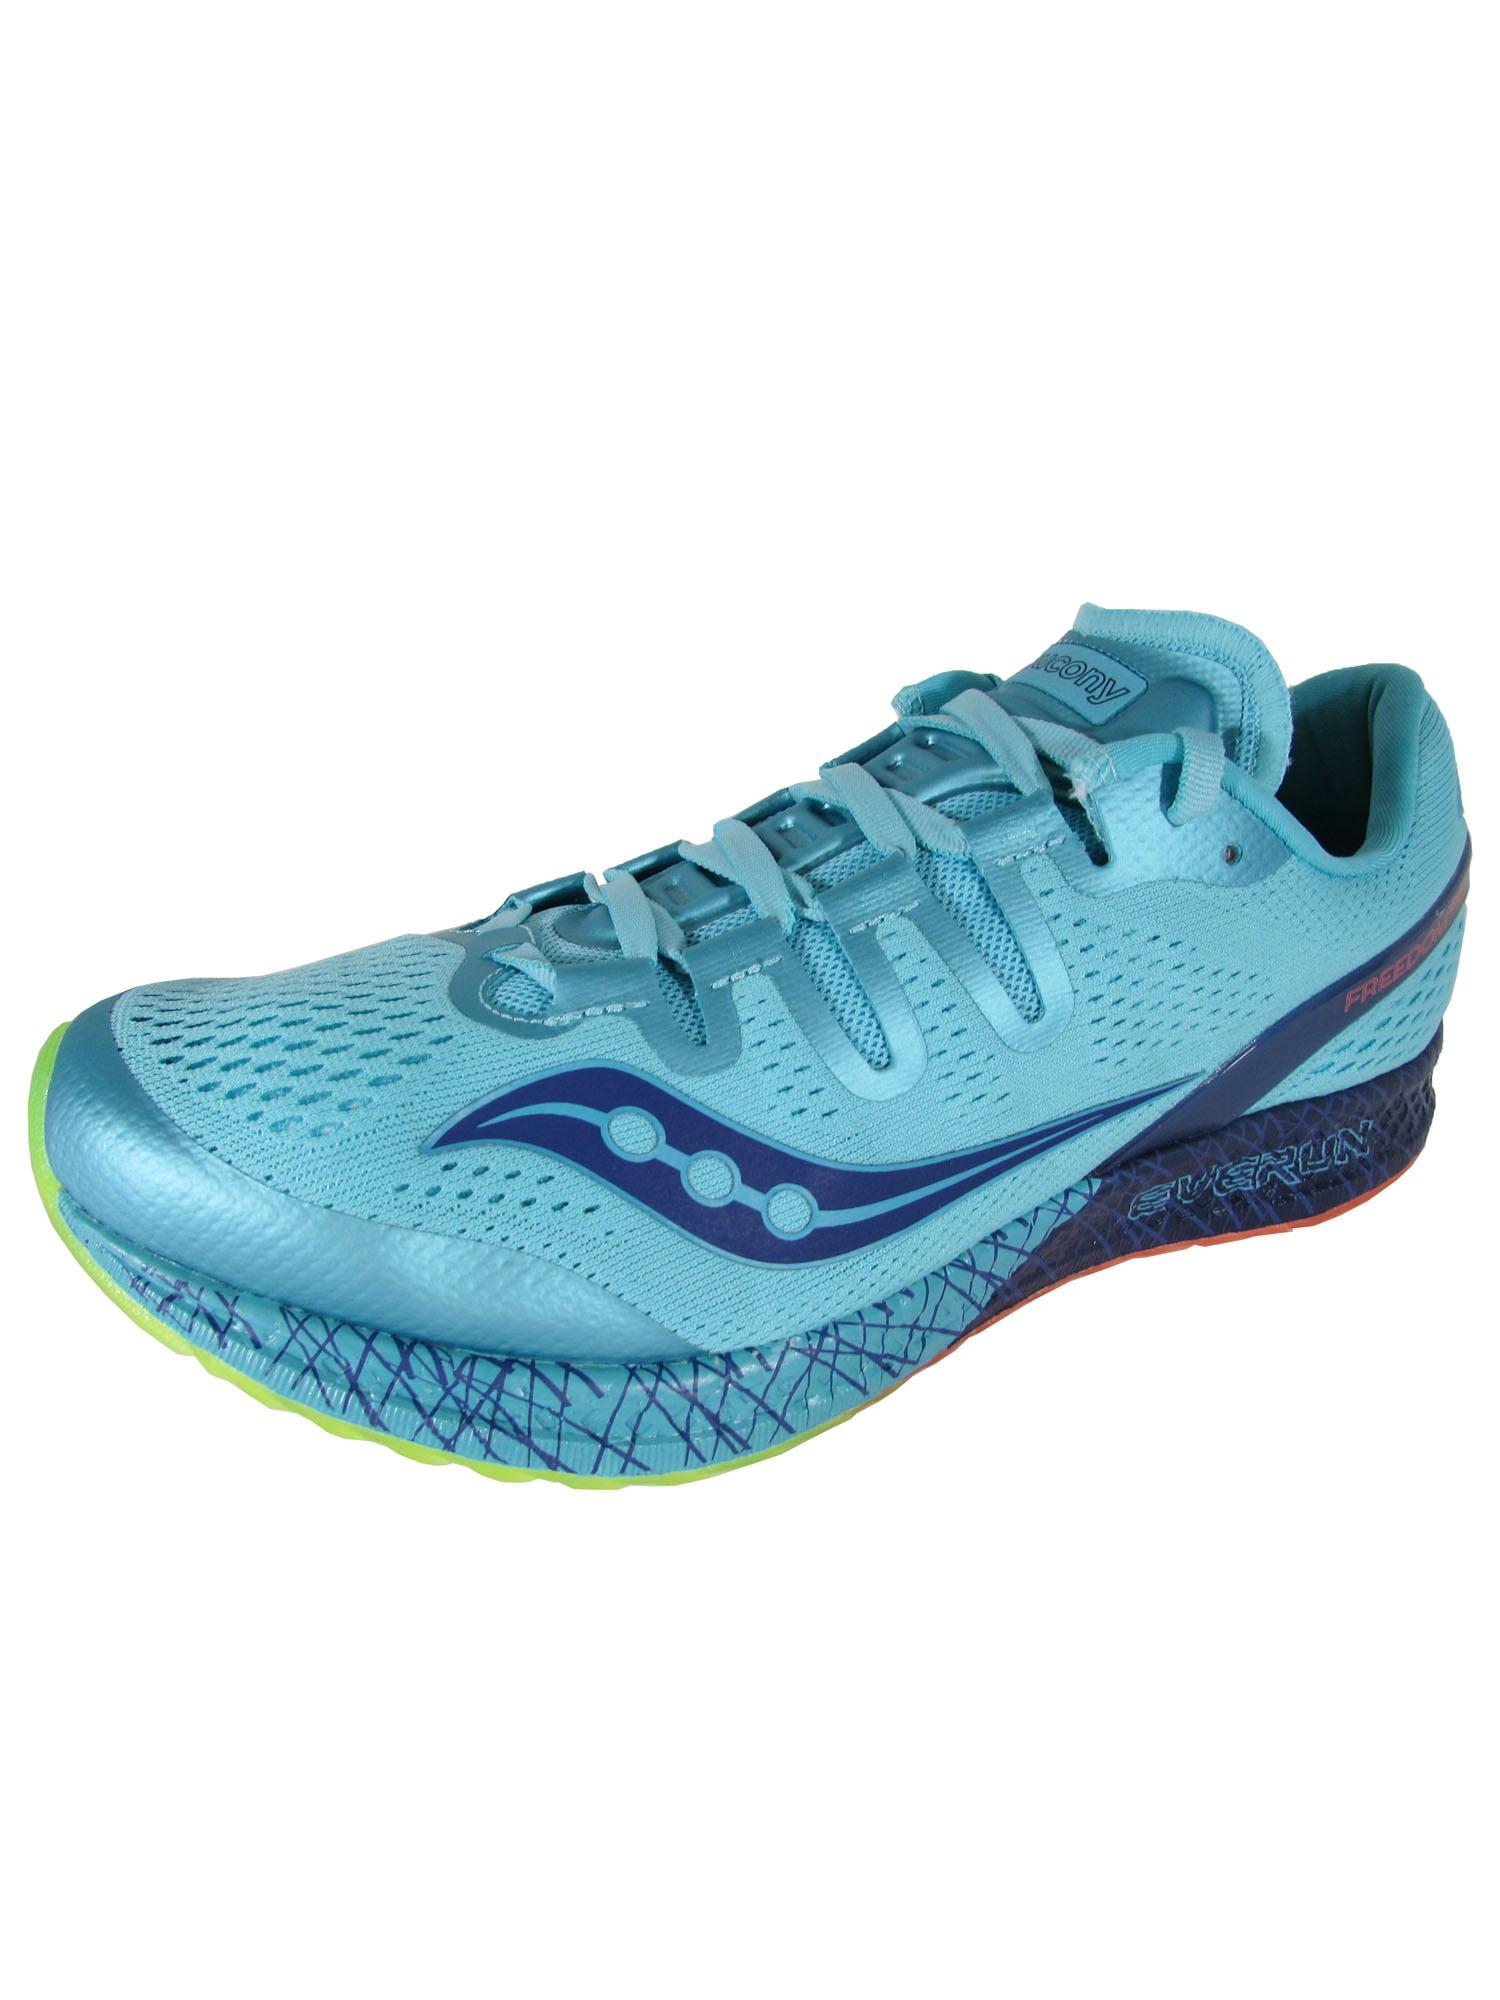 Saucony Women's Freedom Iso Black Ankle-High Mesh Running Shoe - 8.5M